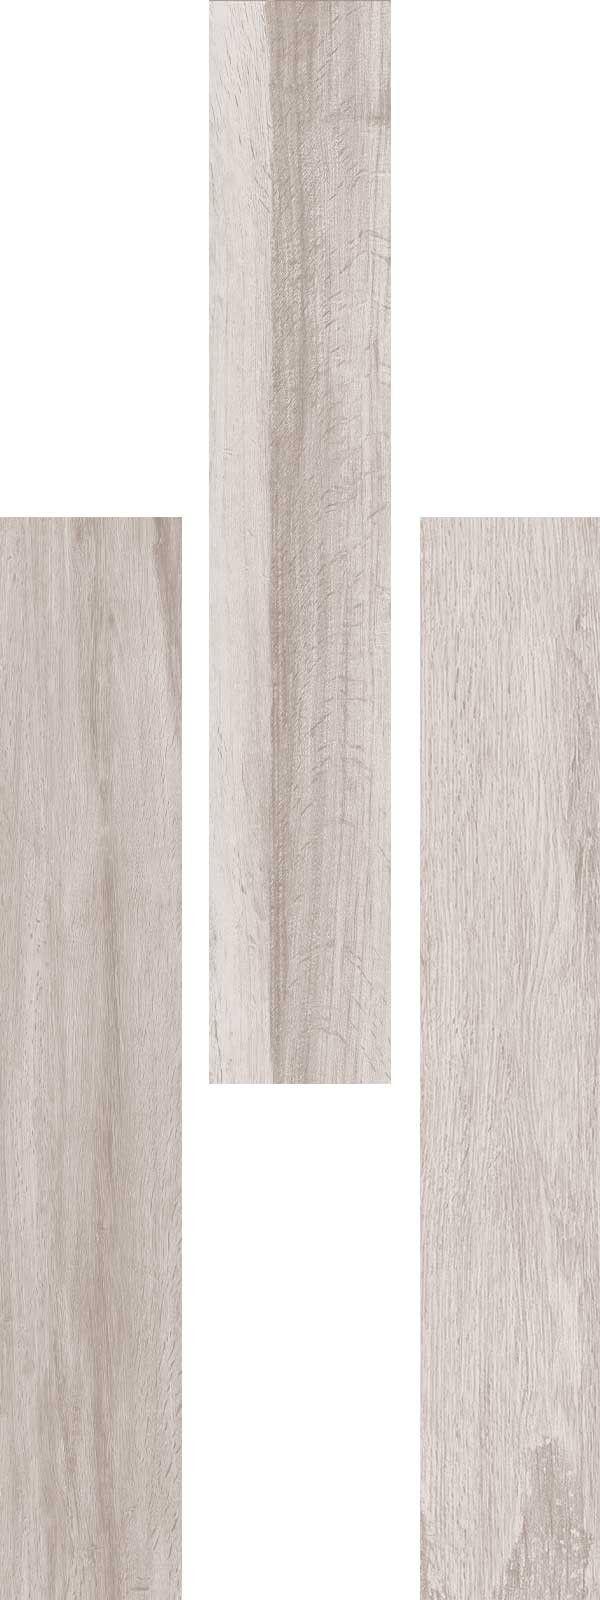 Roca Tile Wood Look Porcelain Botania Series